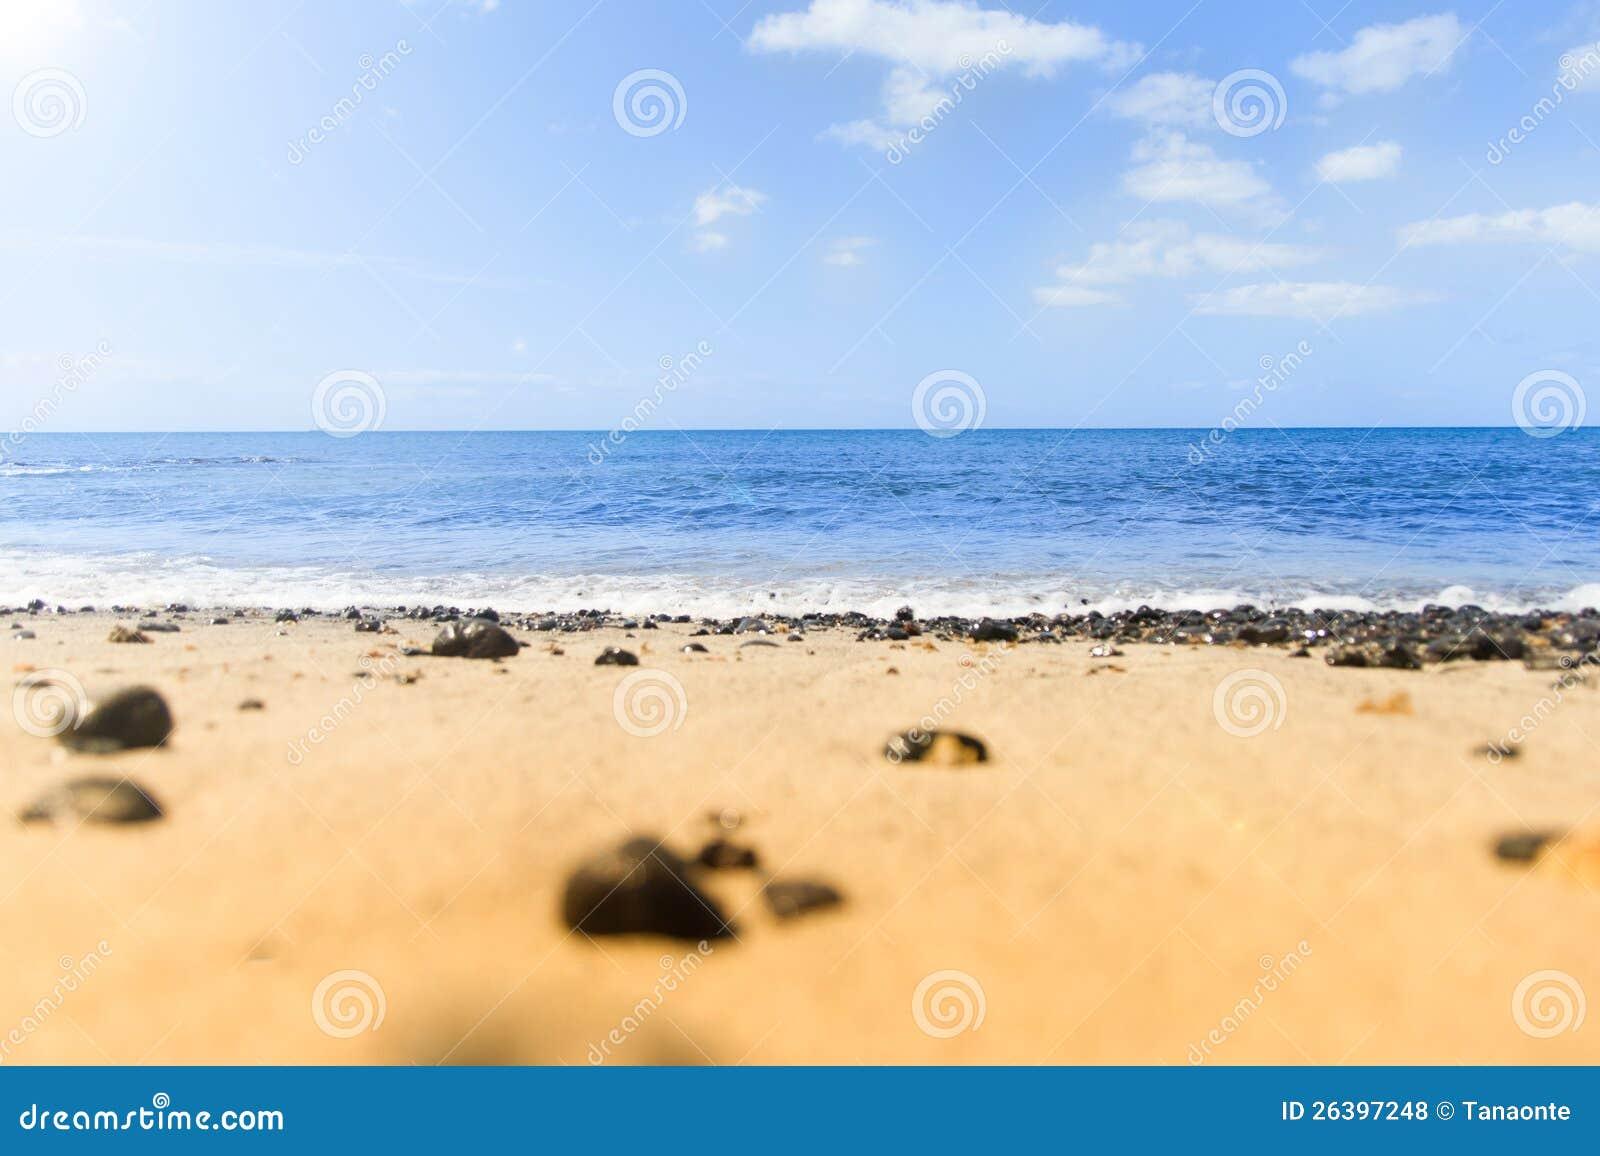 Quiet Beach Royalty Free Stock Photos - Image: 26397248